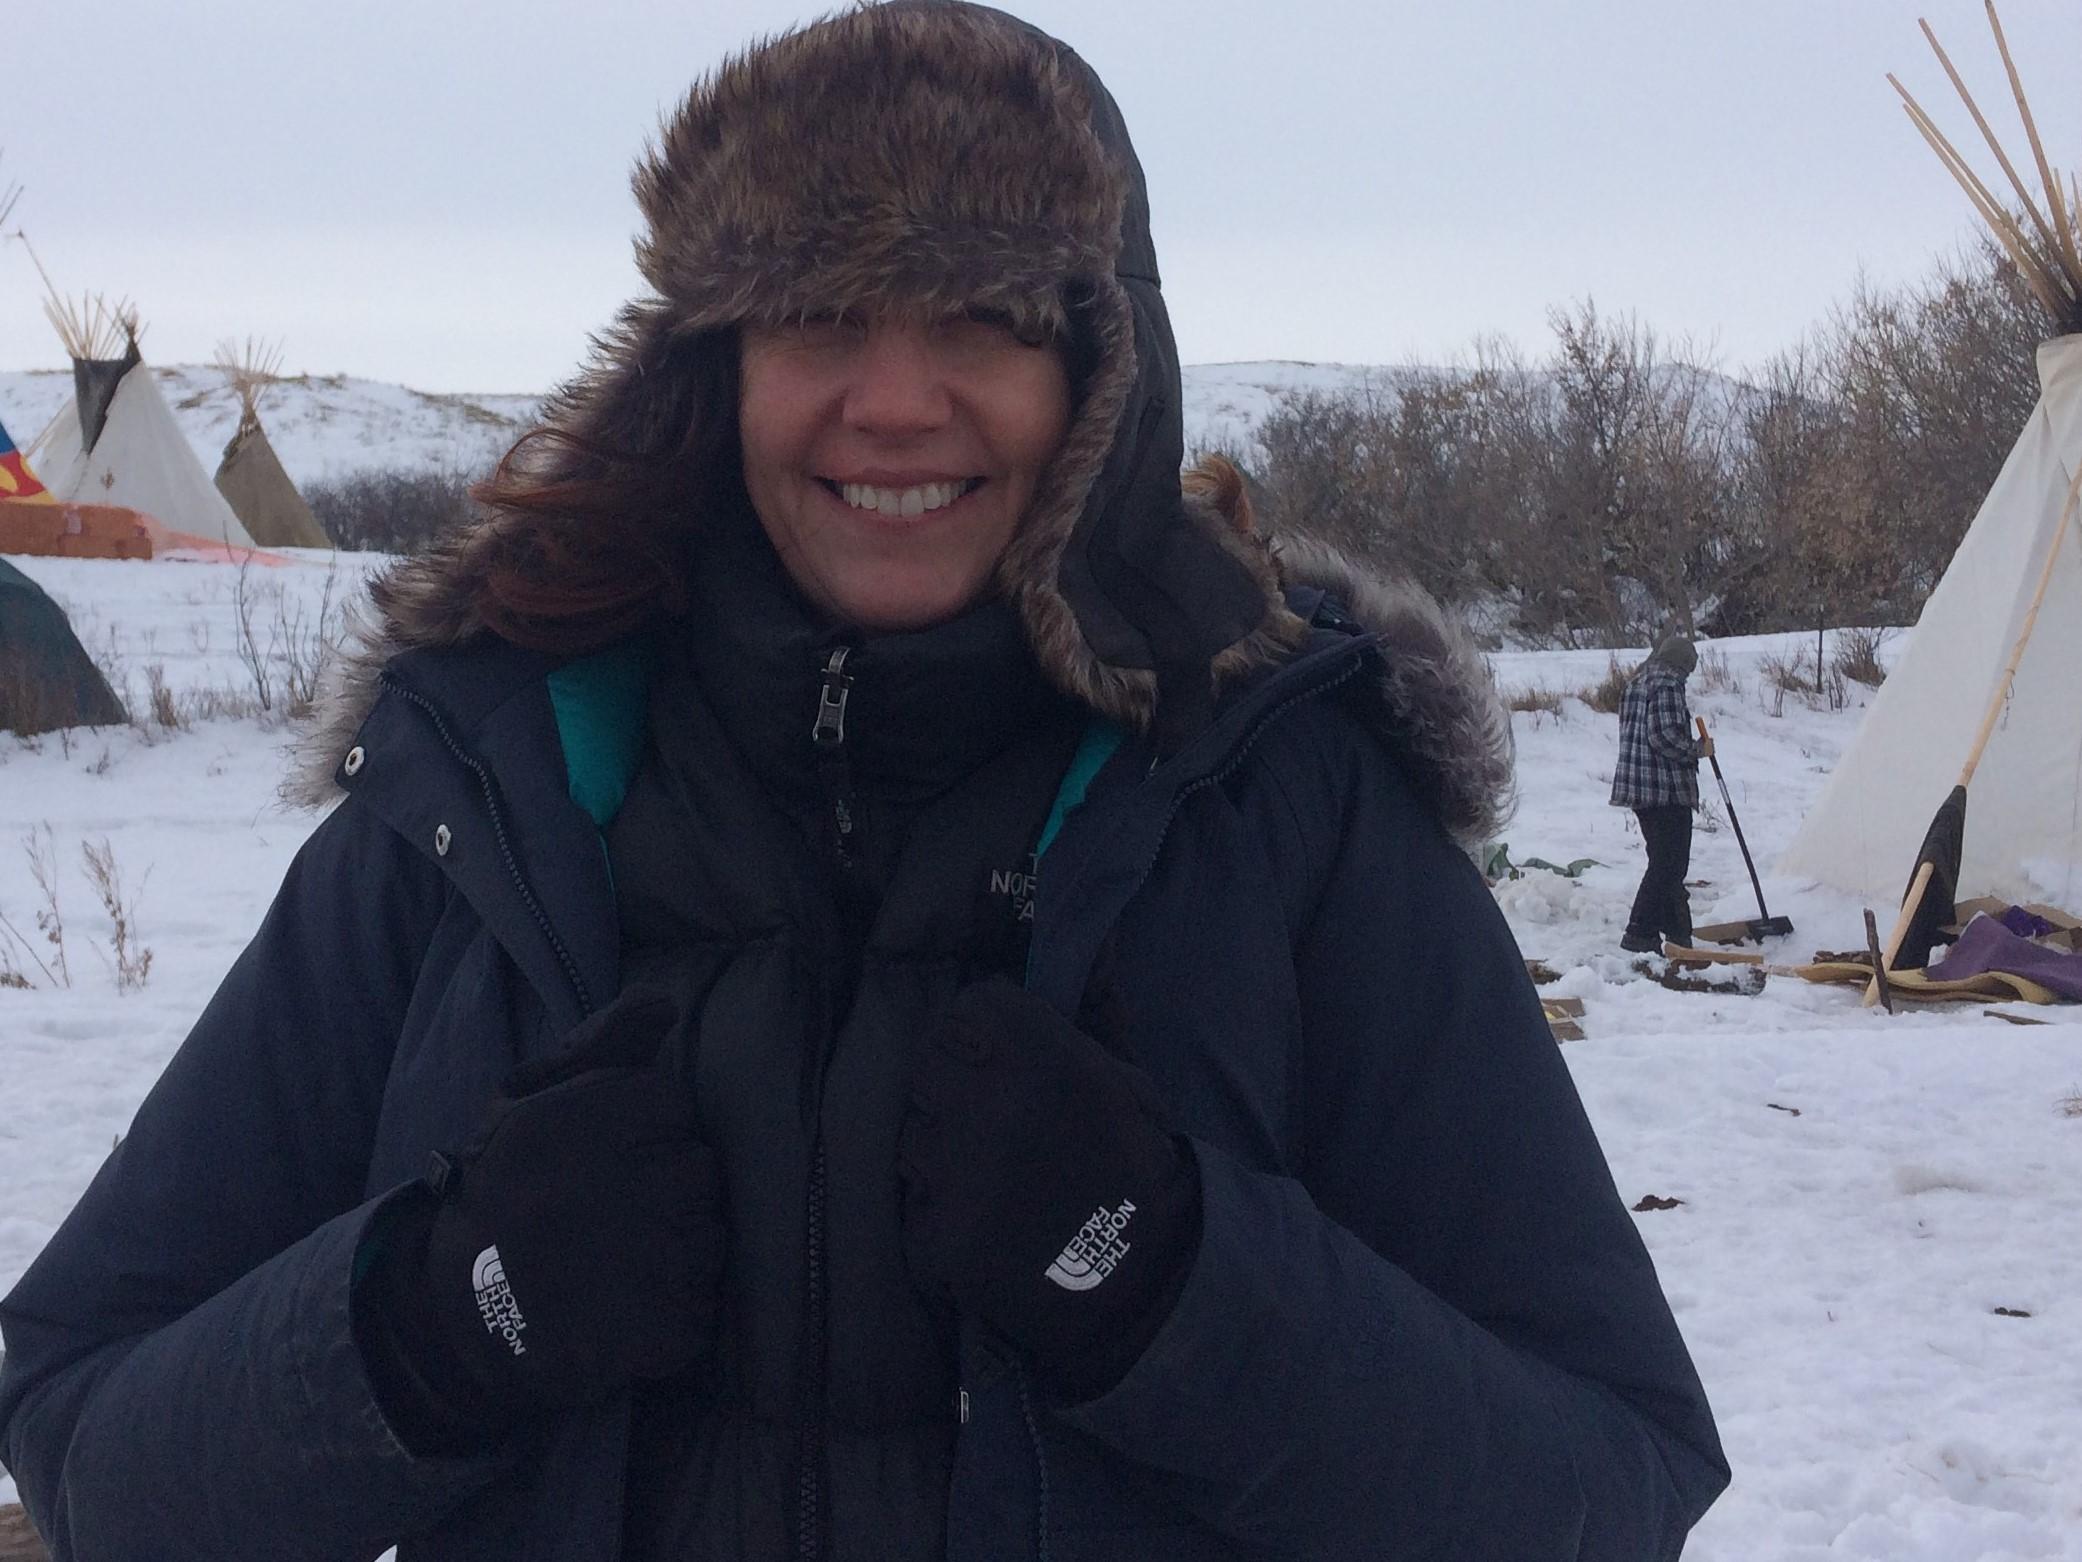 Kim Bartley - Director and DP